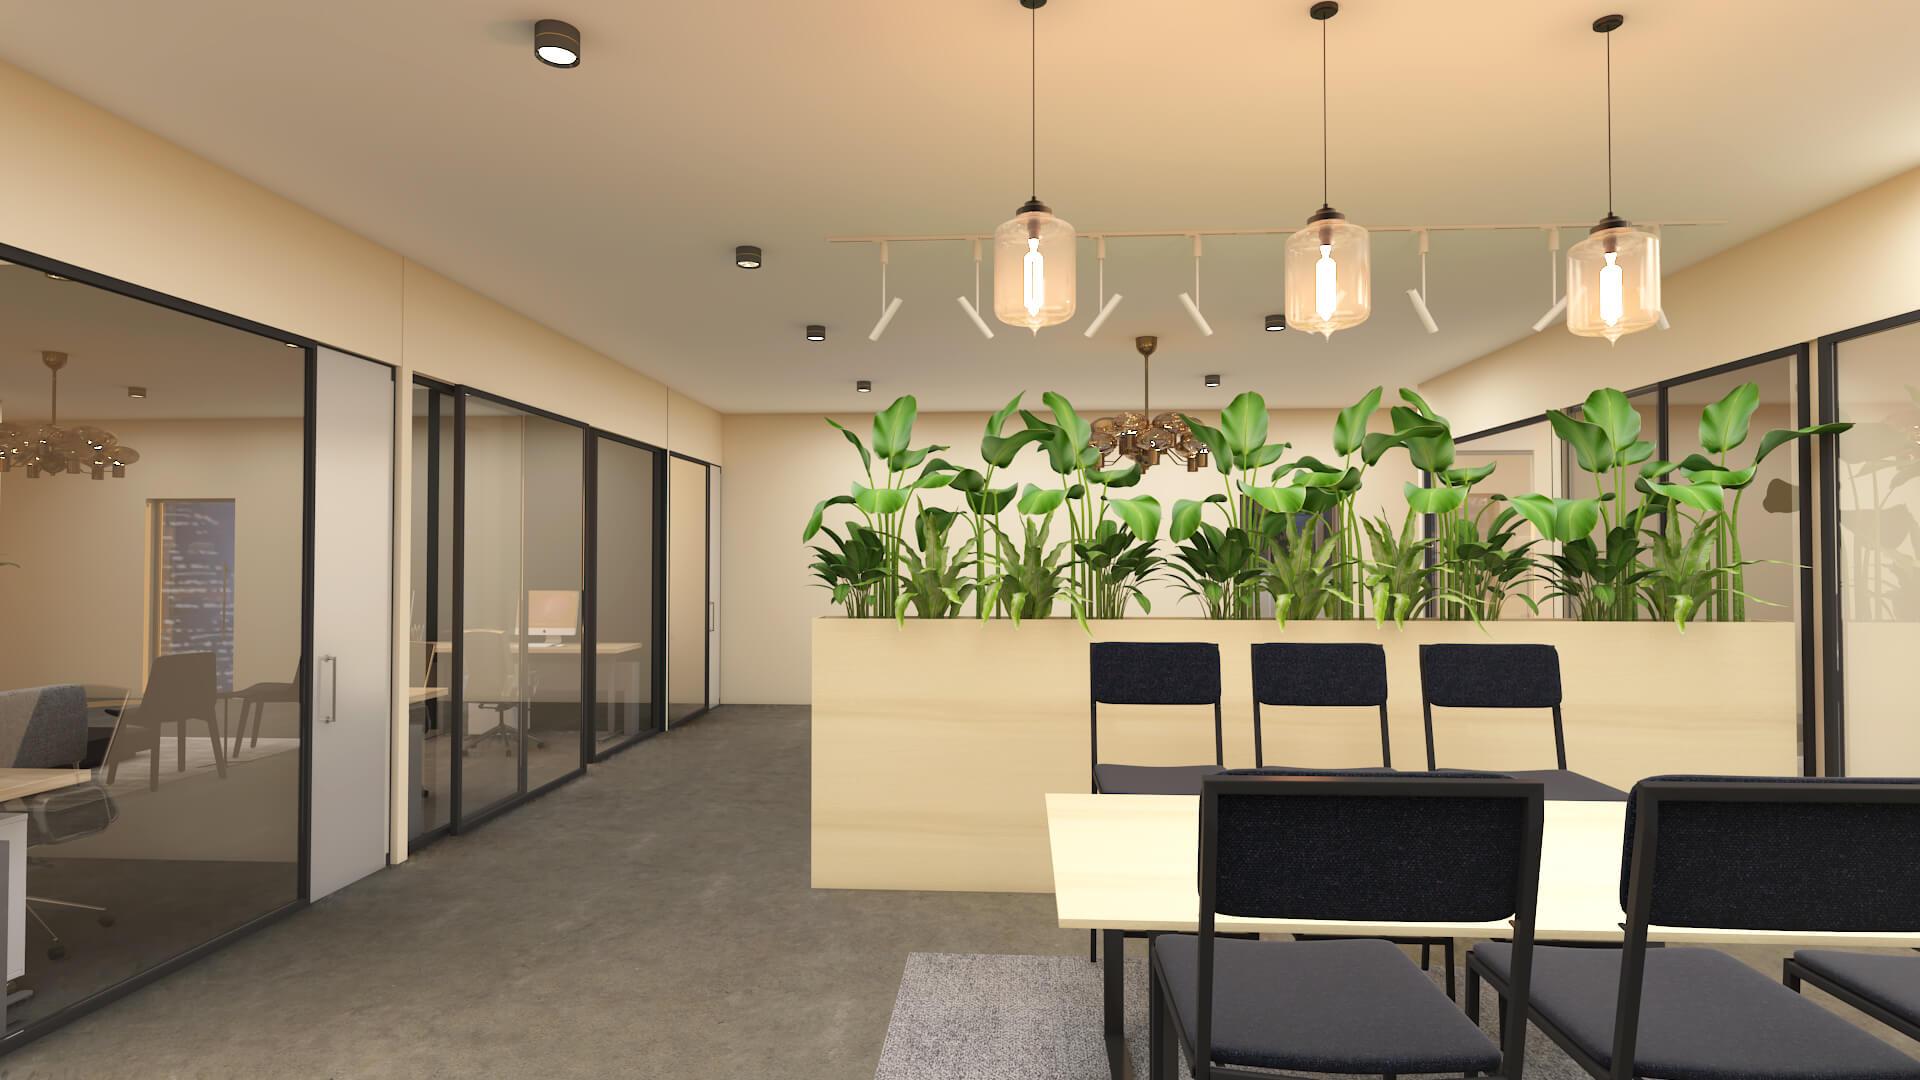 Sustainable interior design trends